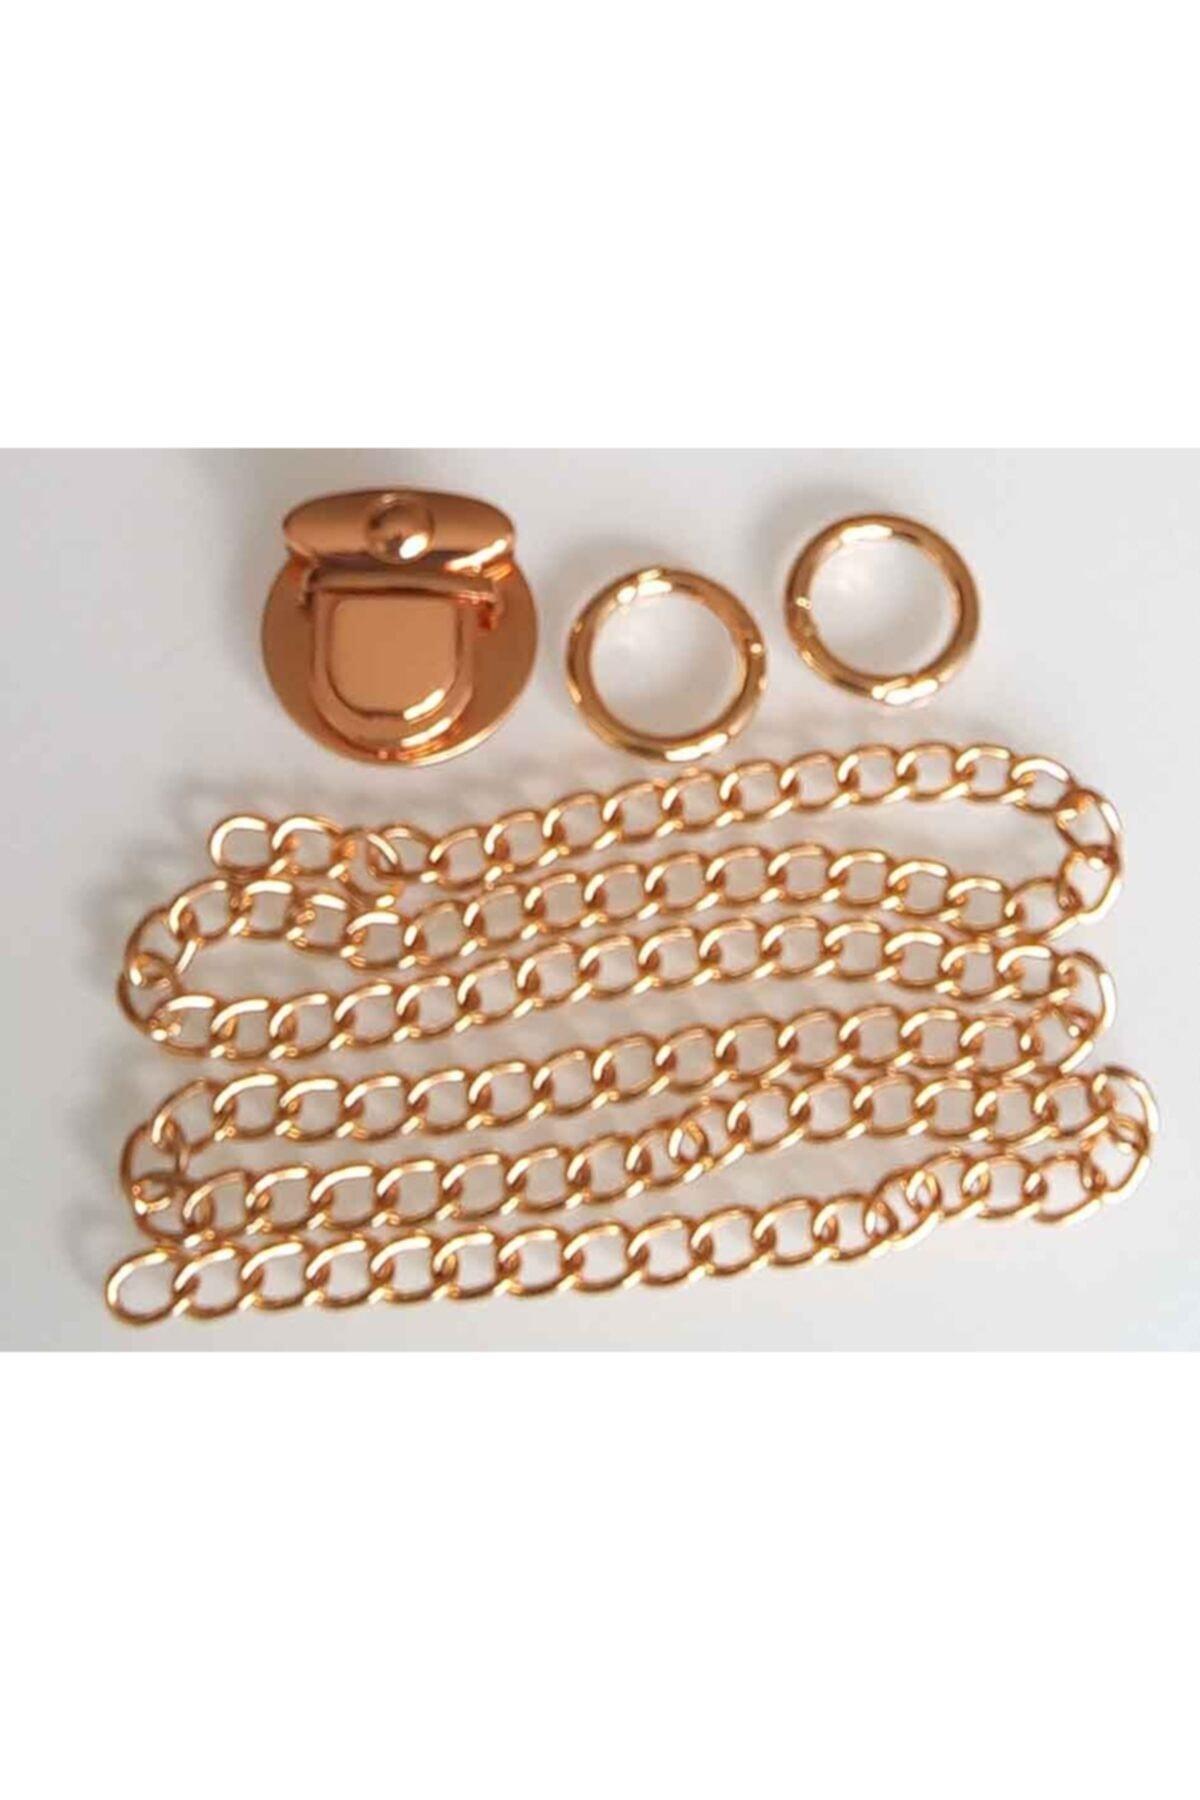 angel çanta aksesuar Light Gold Renk Zincir Set 1